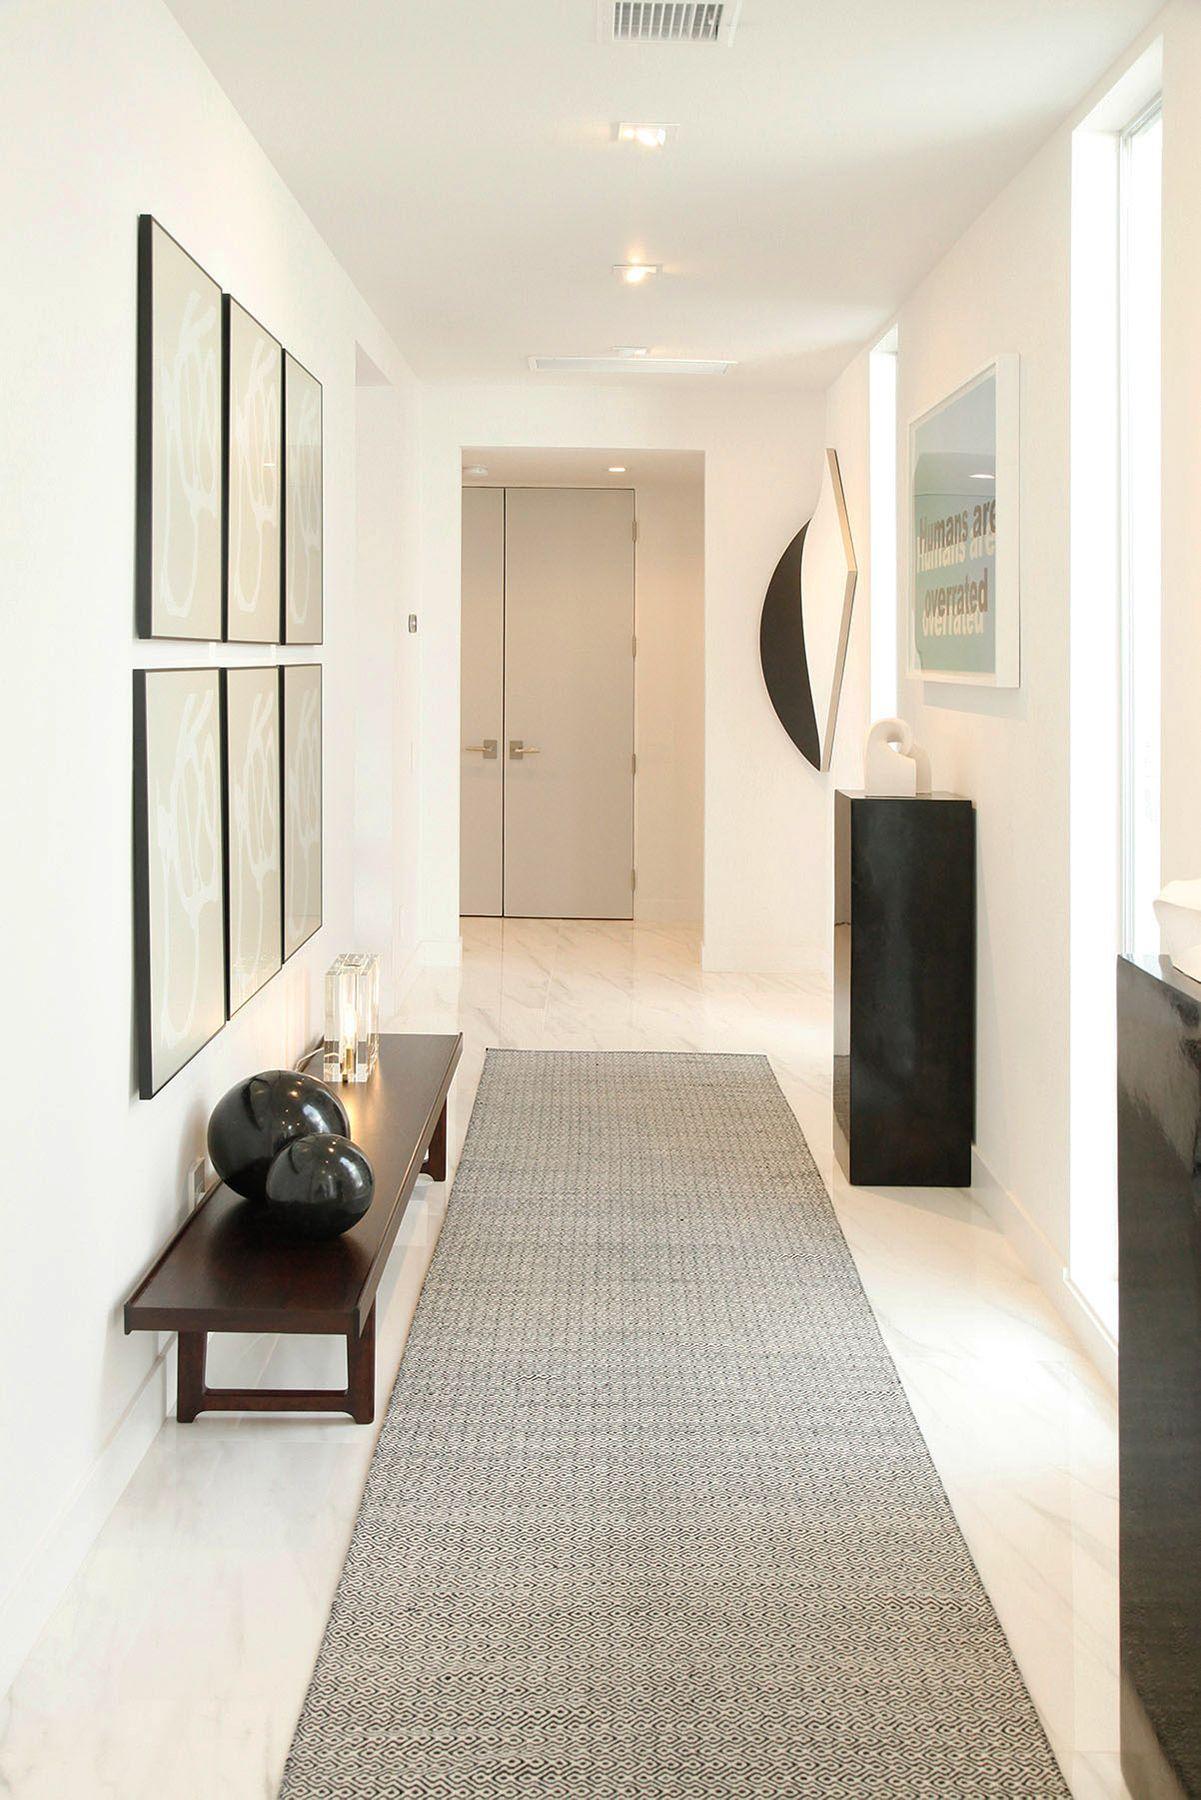 Hallway's & Office's 5.jpg